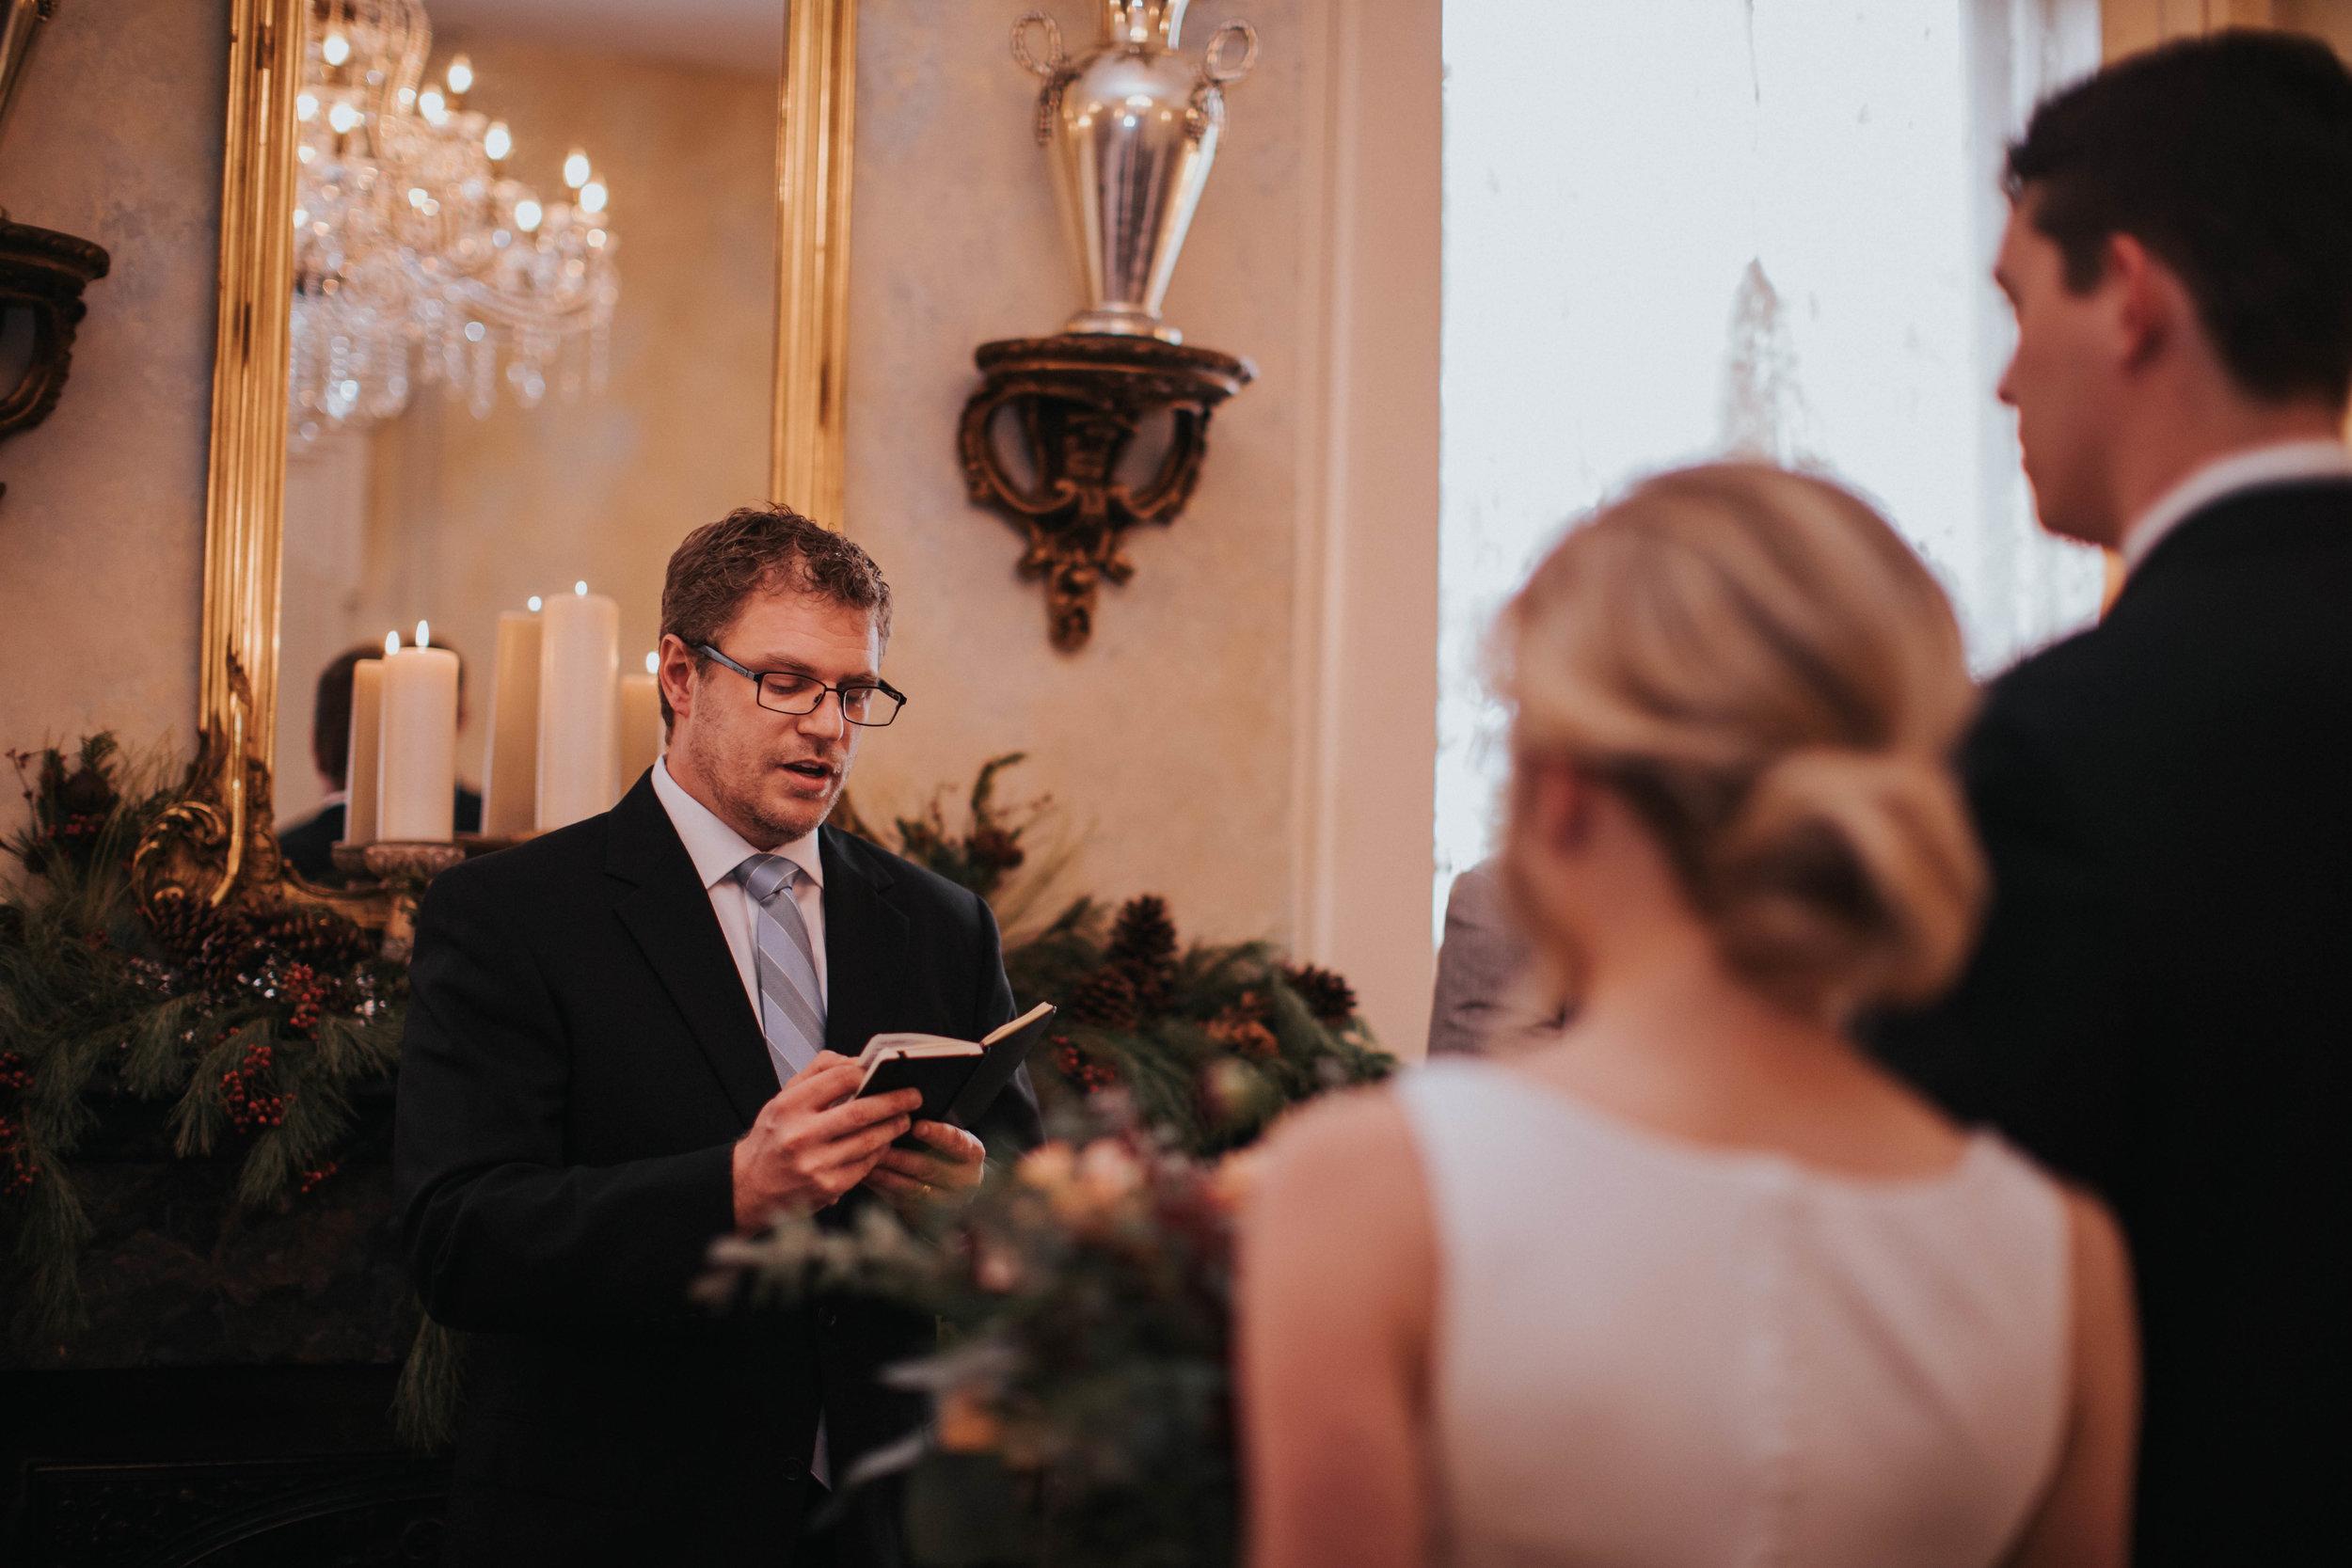 Charis_Lauren_Romantic_Wedding_Photographer_Nashville_03A1397.jpg